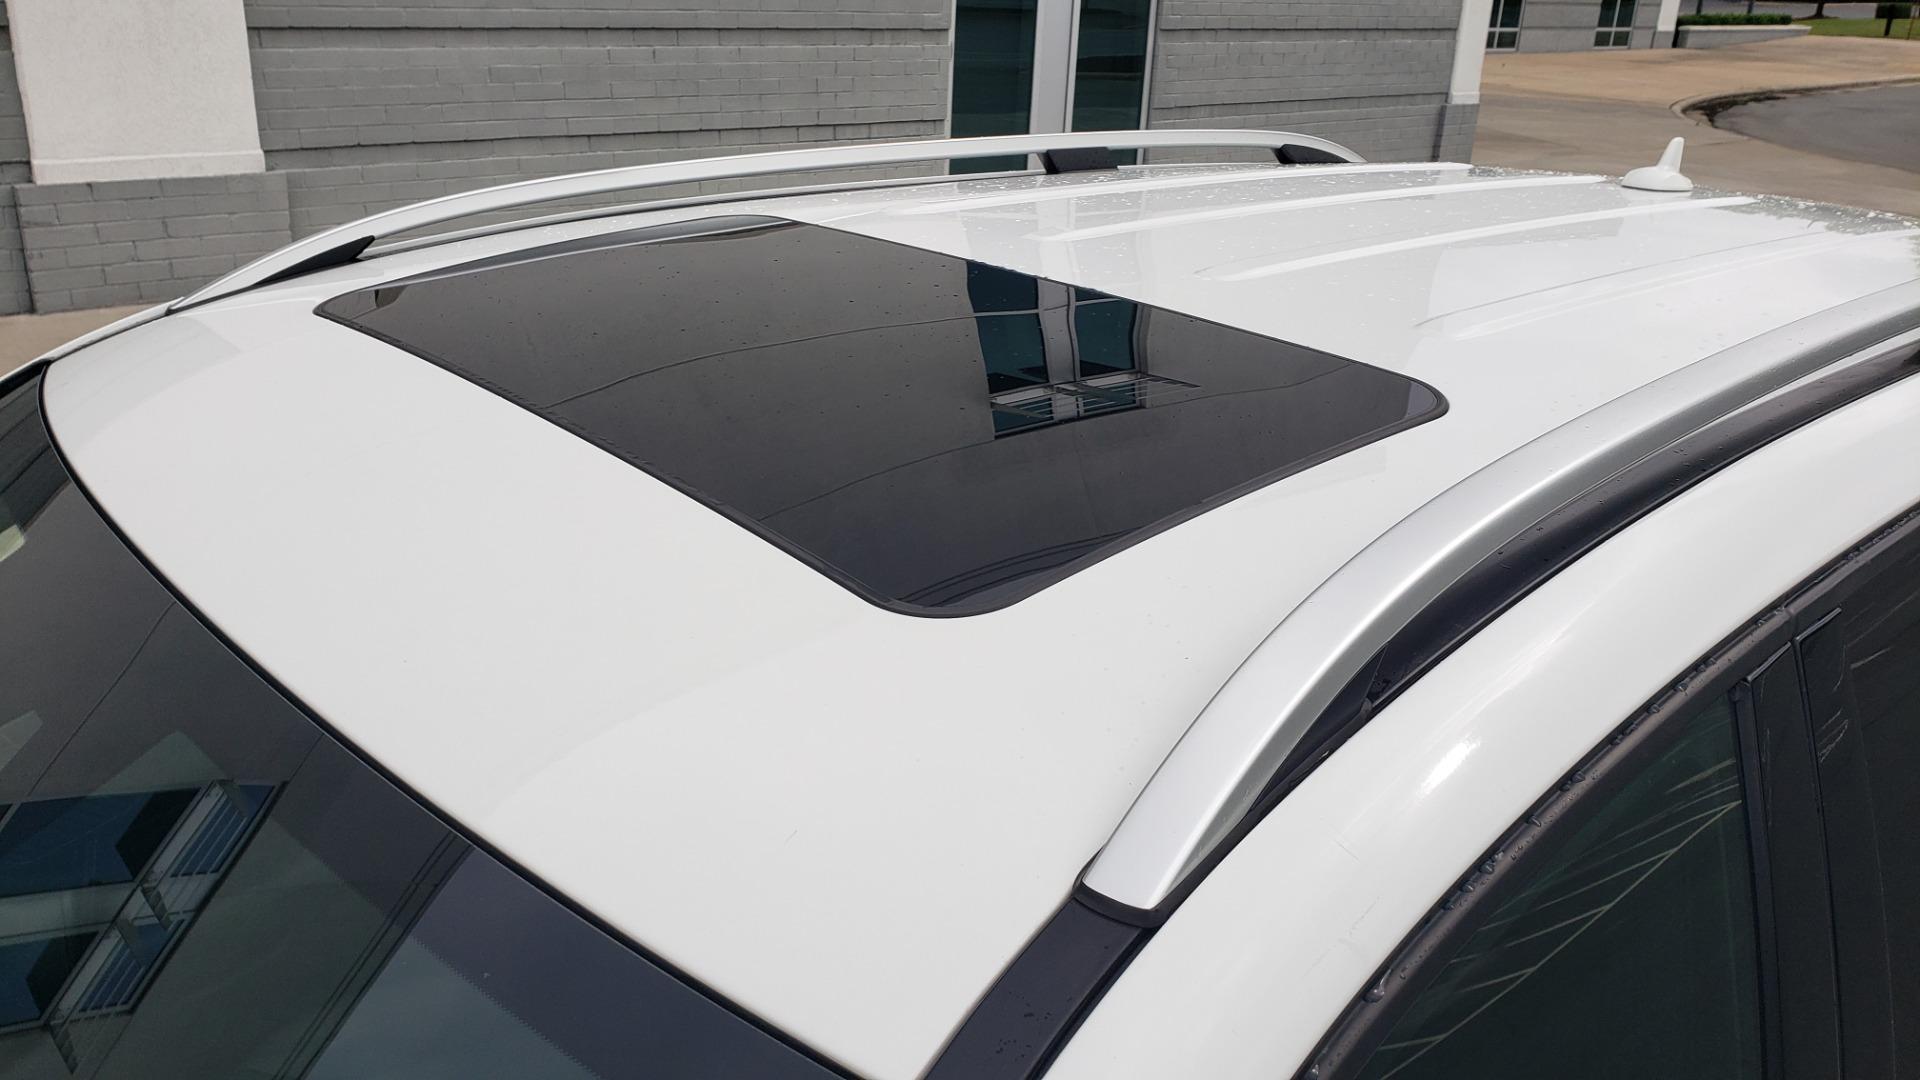 Used 2018 Mercedes-Benz GLE 350 4MATIC / PREM PKG / NAV / PARK ASST / K/H SND / HITCH / REARVIEW for sale $40,801 at Formula Imports in Charlotte NC 28227 11